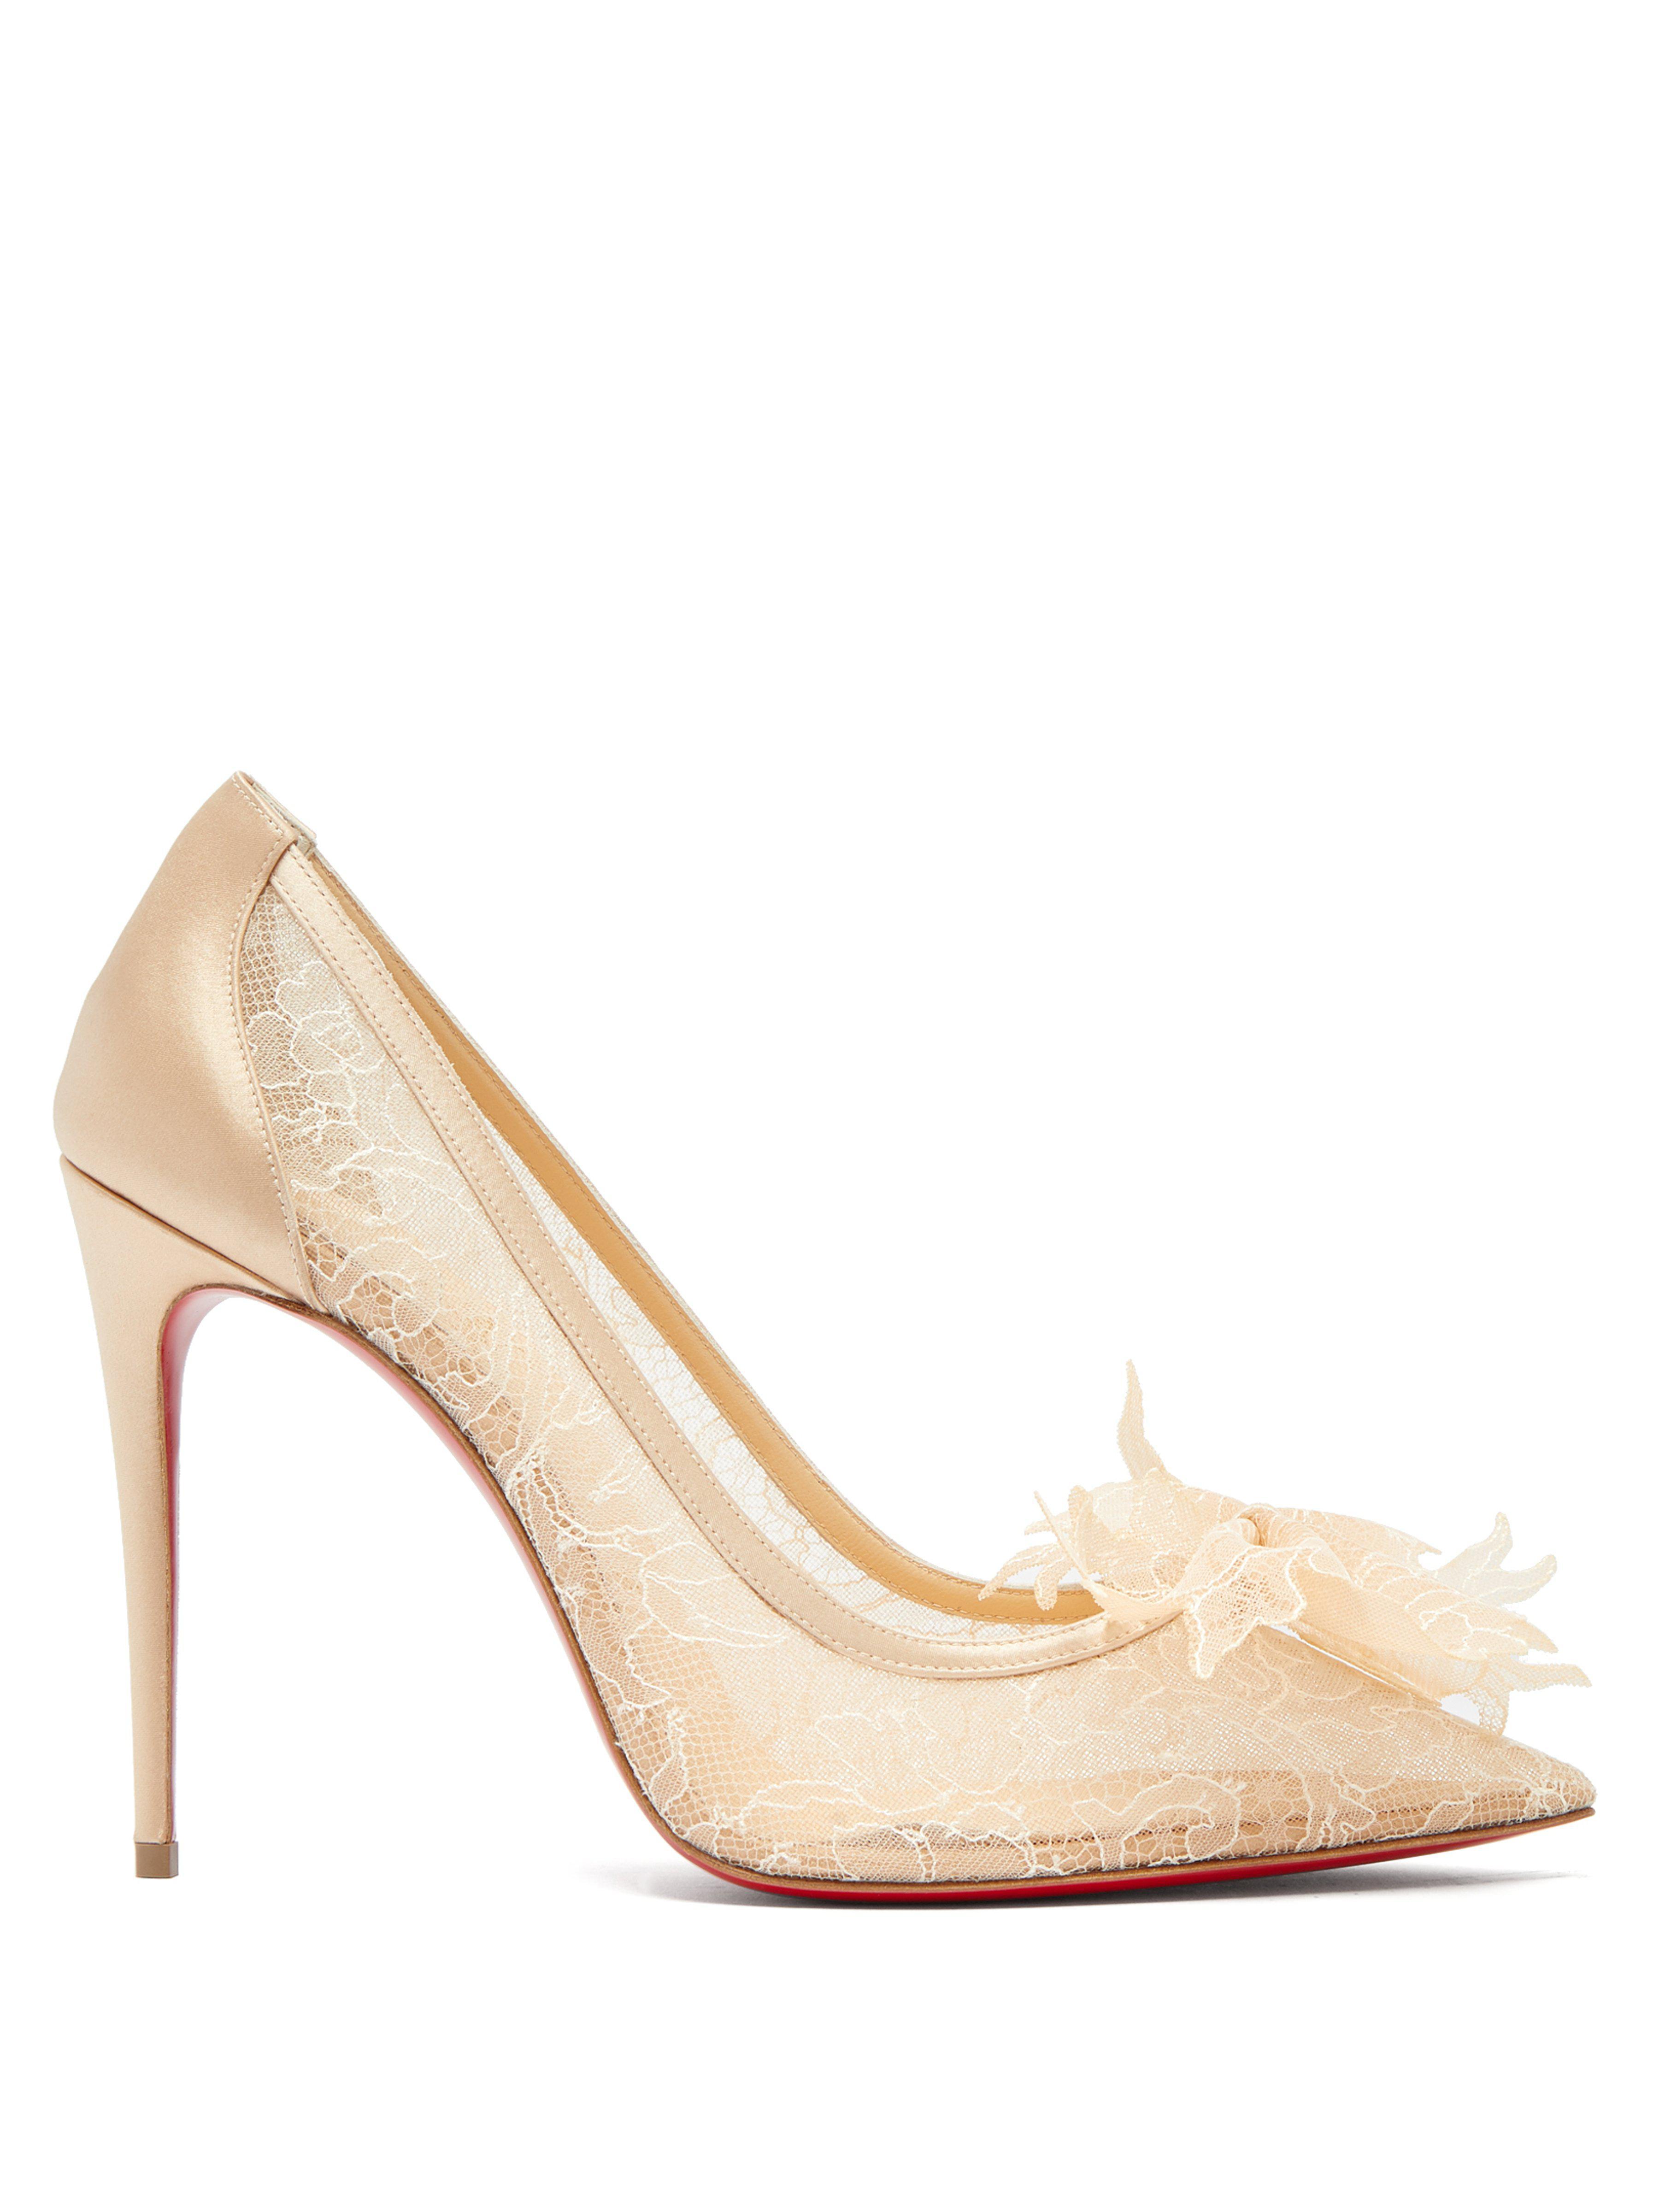 eb65d2cb2f9e Christian Louboutin. Women s Delicatissima 100 Lace Court Shoes